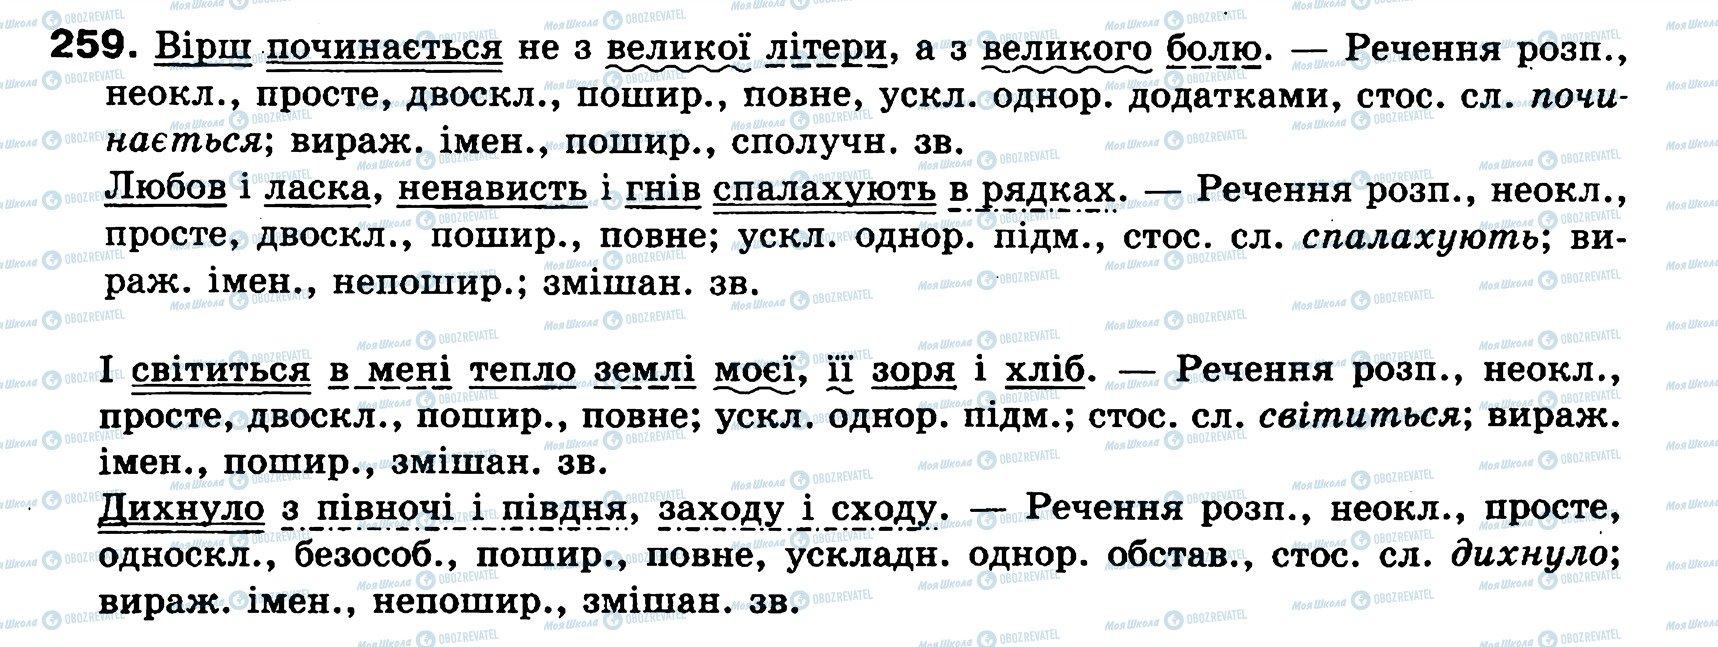 ГДЗ Укр мова 8 класс страница 259